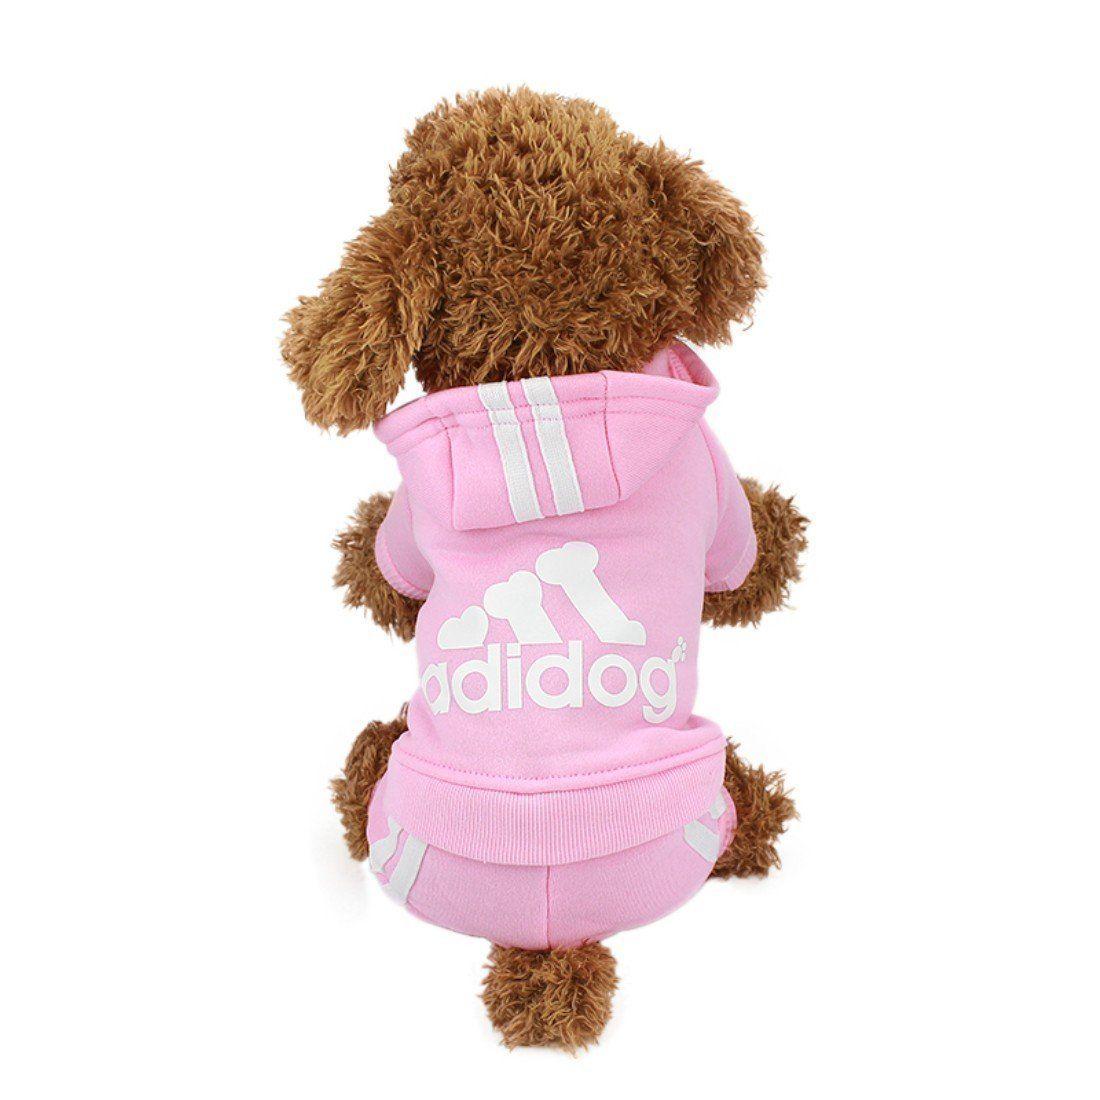 Idepet(TM) Adidog Pet Dog Cat Clothes 4 Legs Cotton Puppy